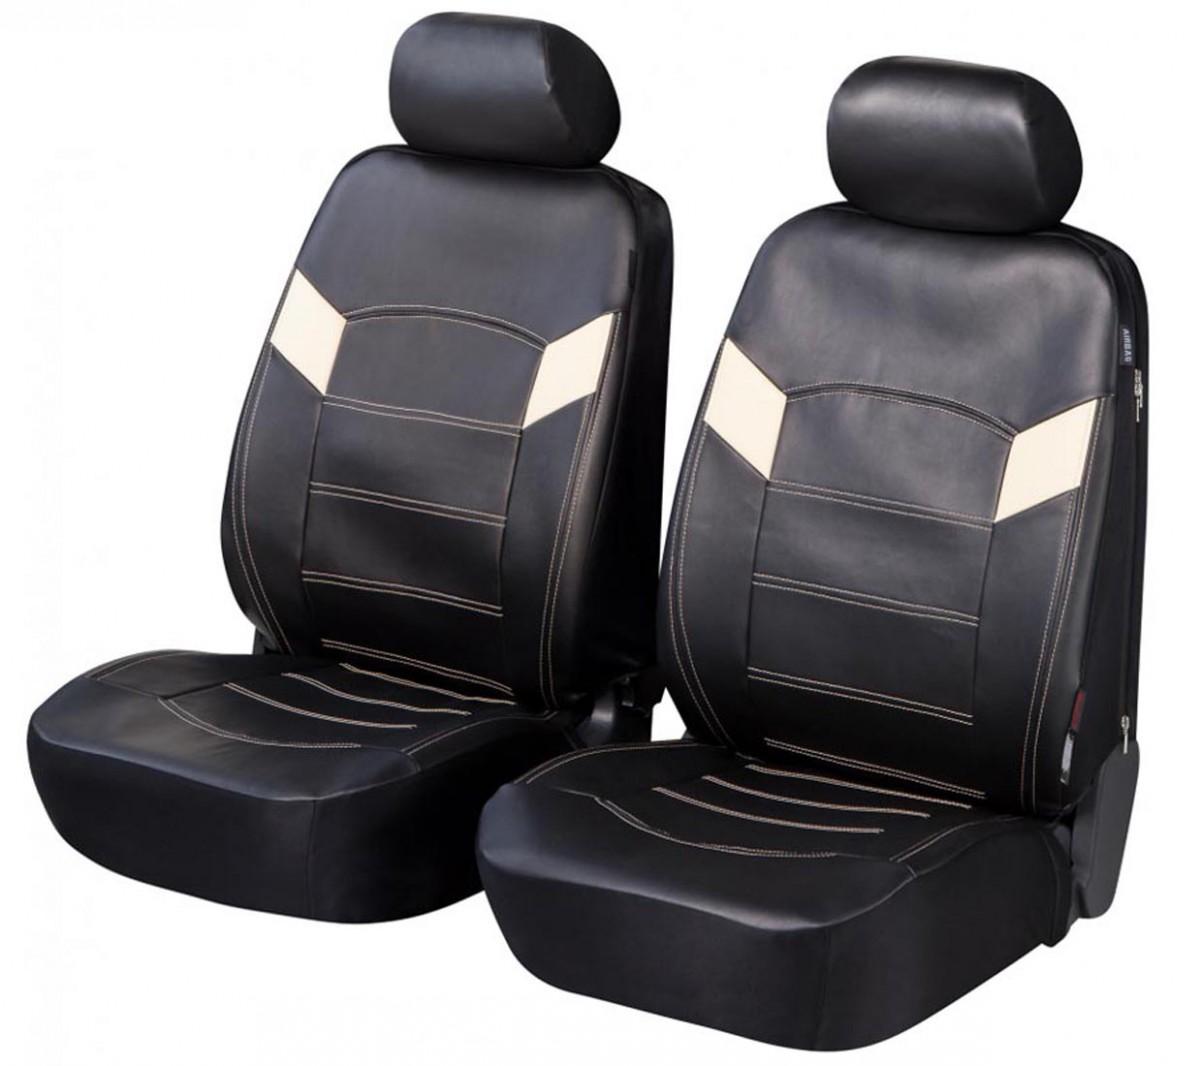 toyota landcruiser housse si ge auto si ges avant noir similicuir. Black Bedroom Furniture Sets. Home Design Ideas